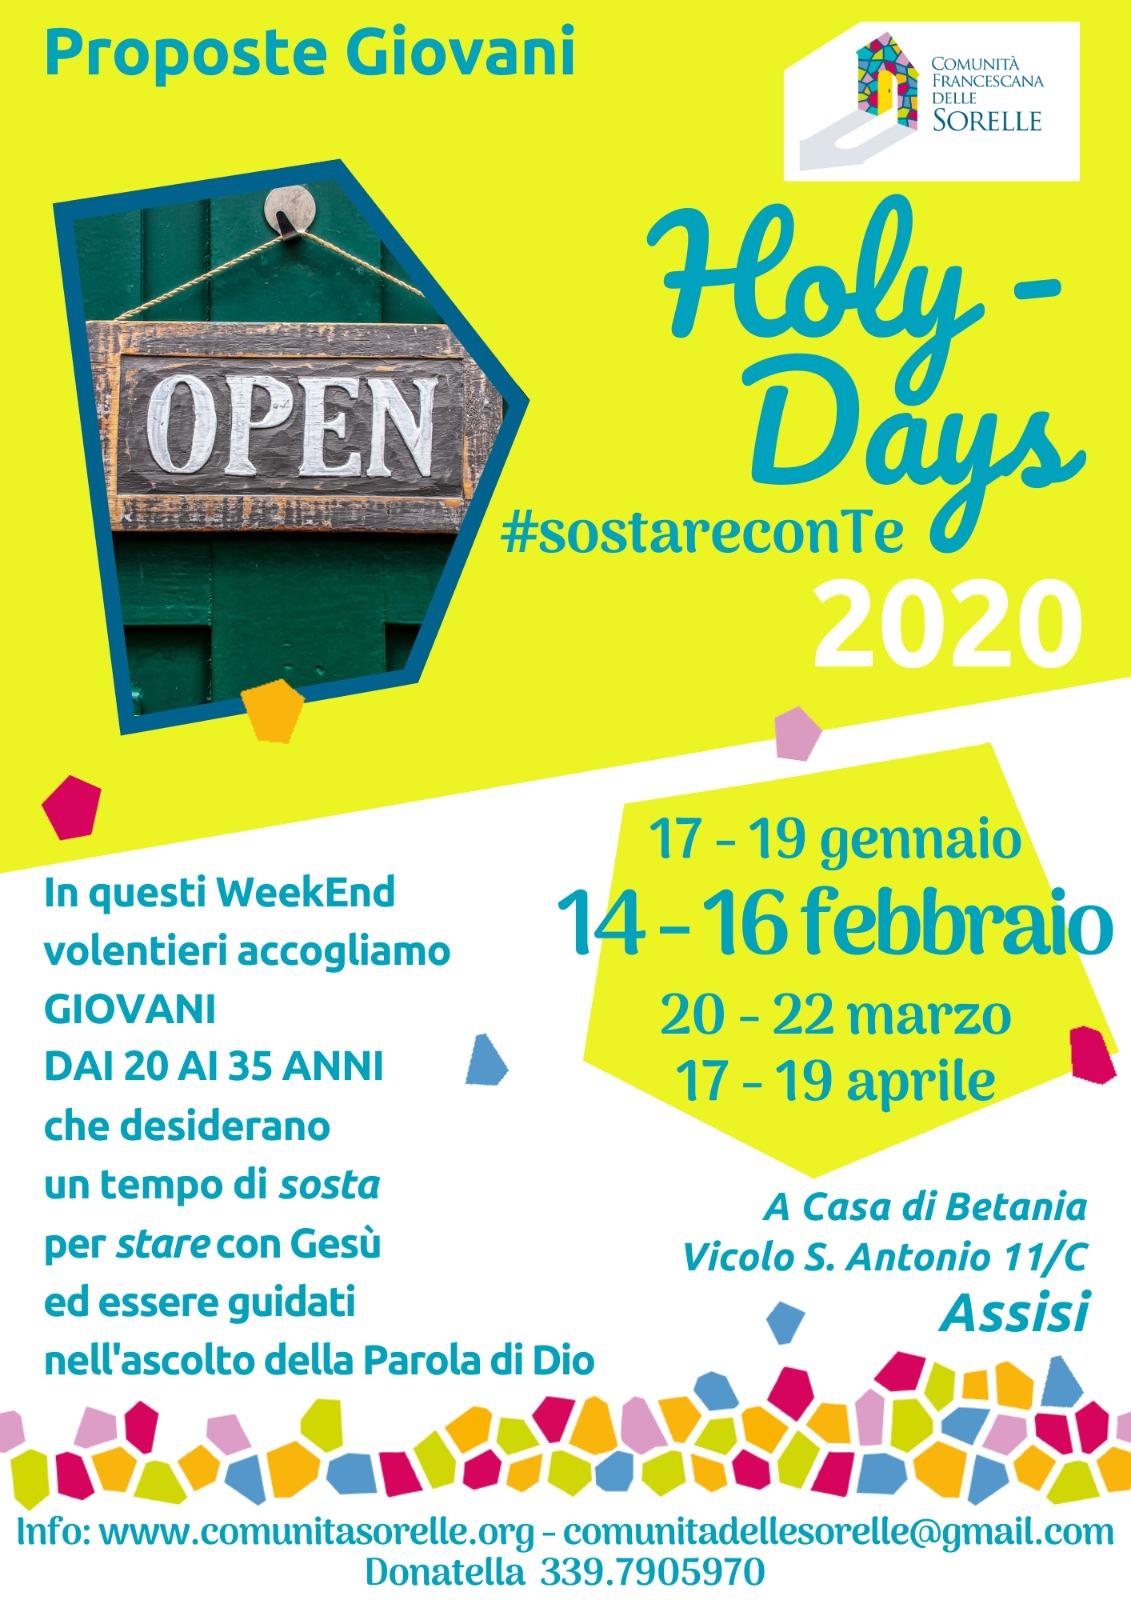 14-16 febbraio                   Weekend ad Assisi